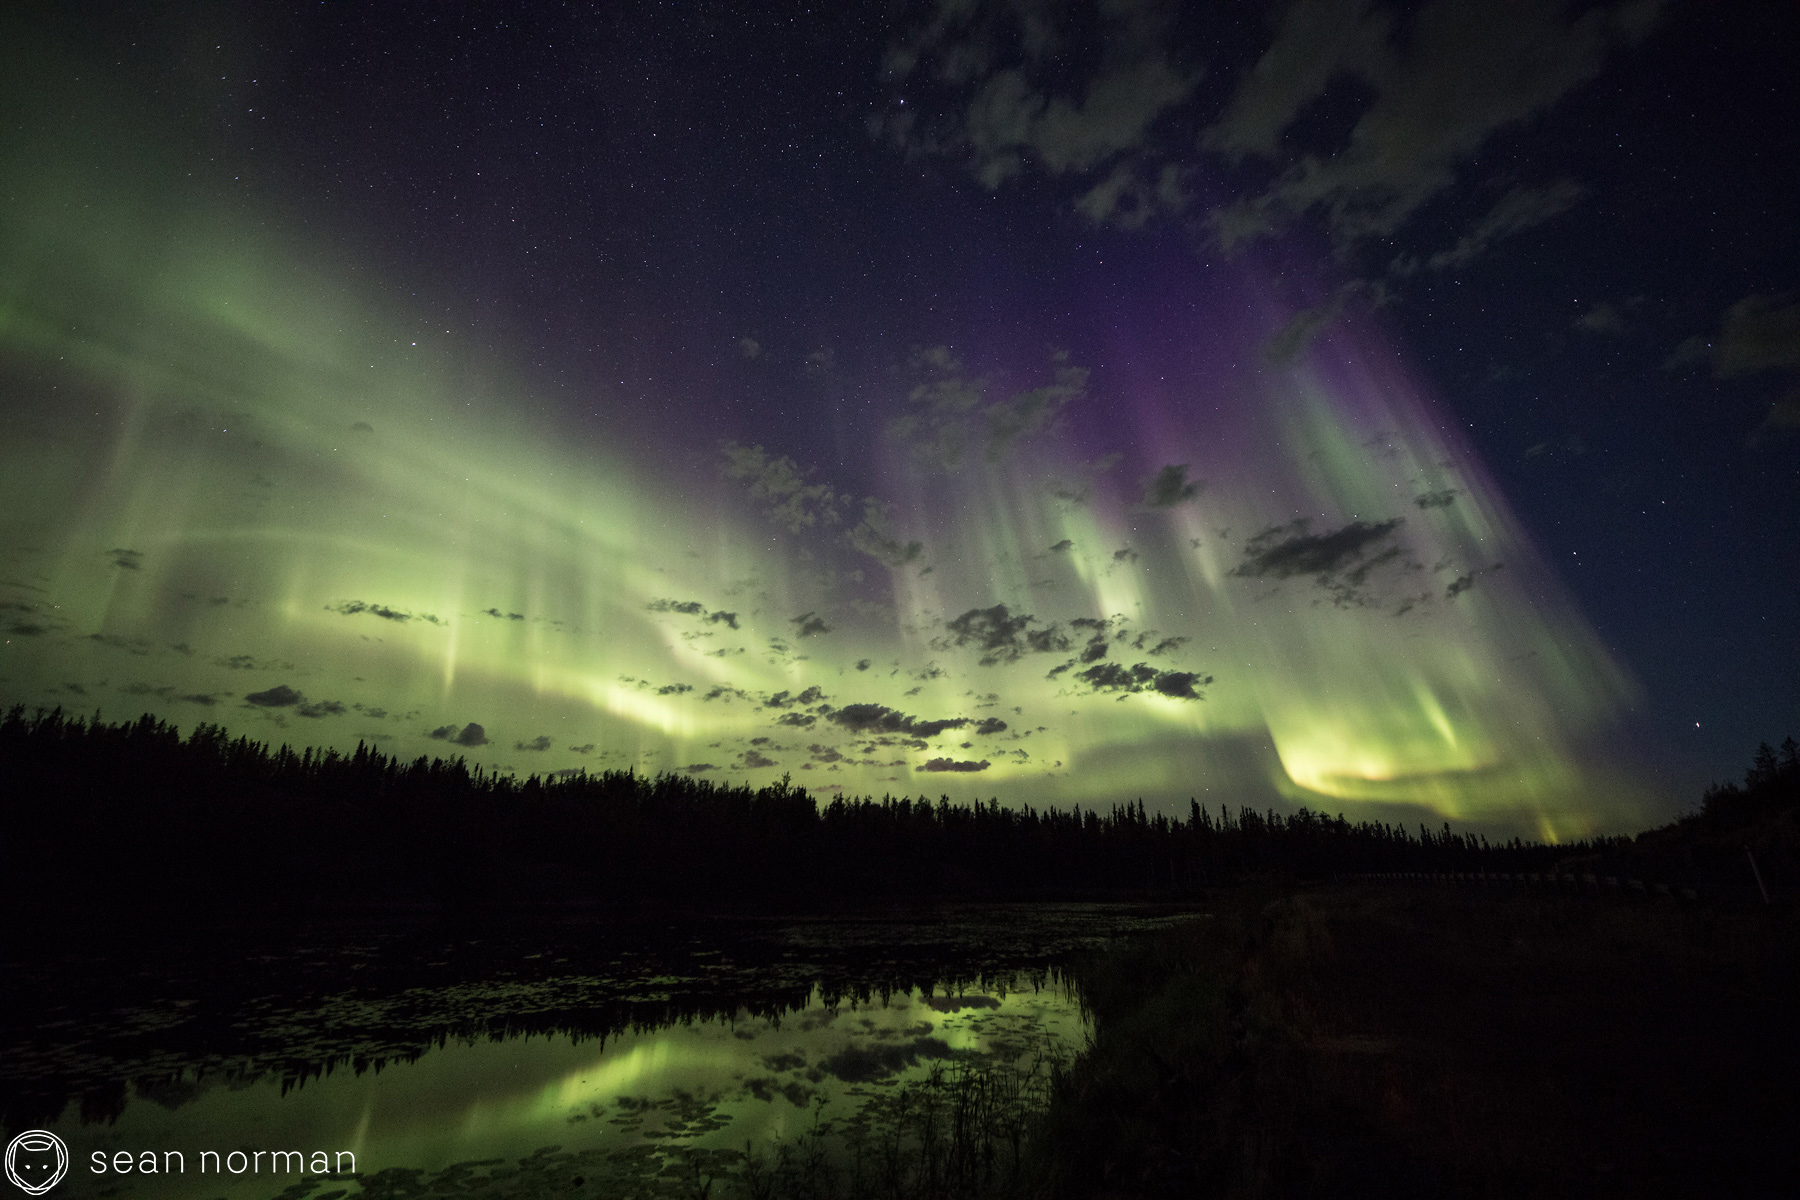 Autumn Auora Viewing in Yellowknife - Sean Norman Aurora Chaser - 3.jpg